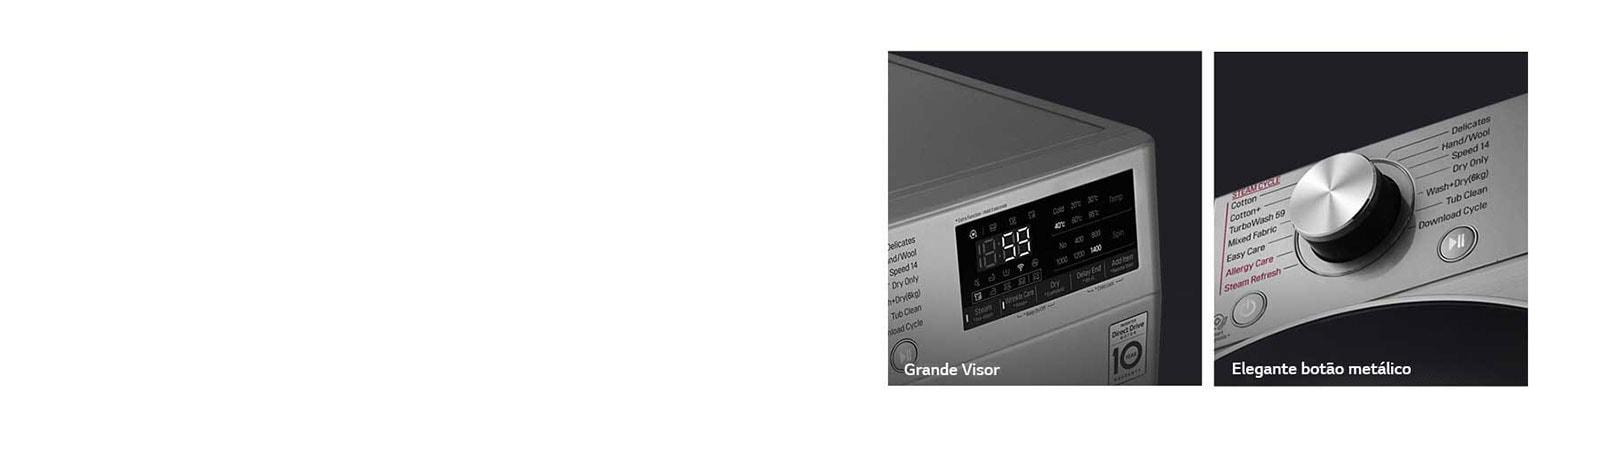 WM-Vivace-V700-VC3-White-09-Design-D01_t1